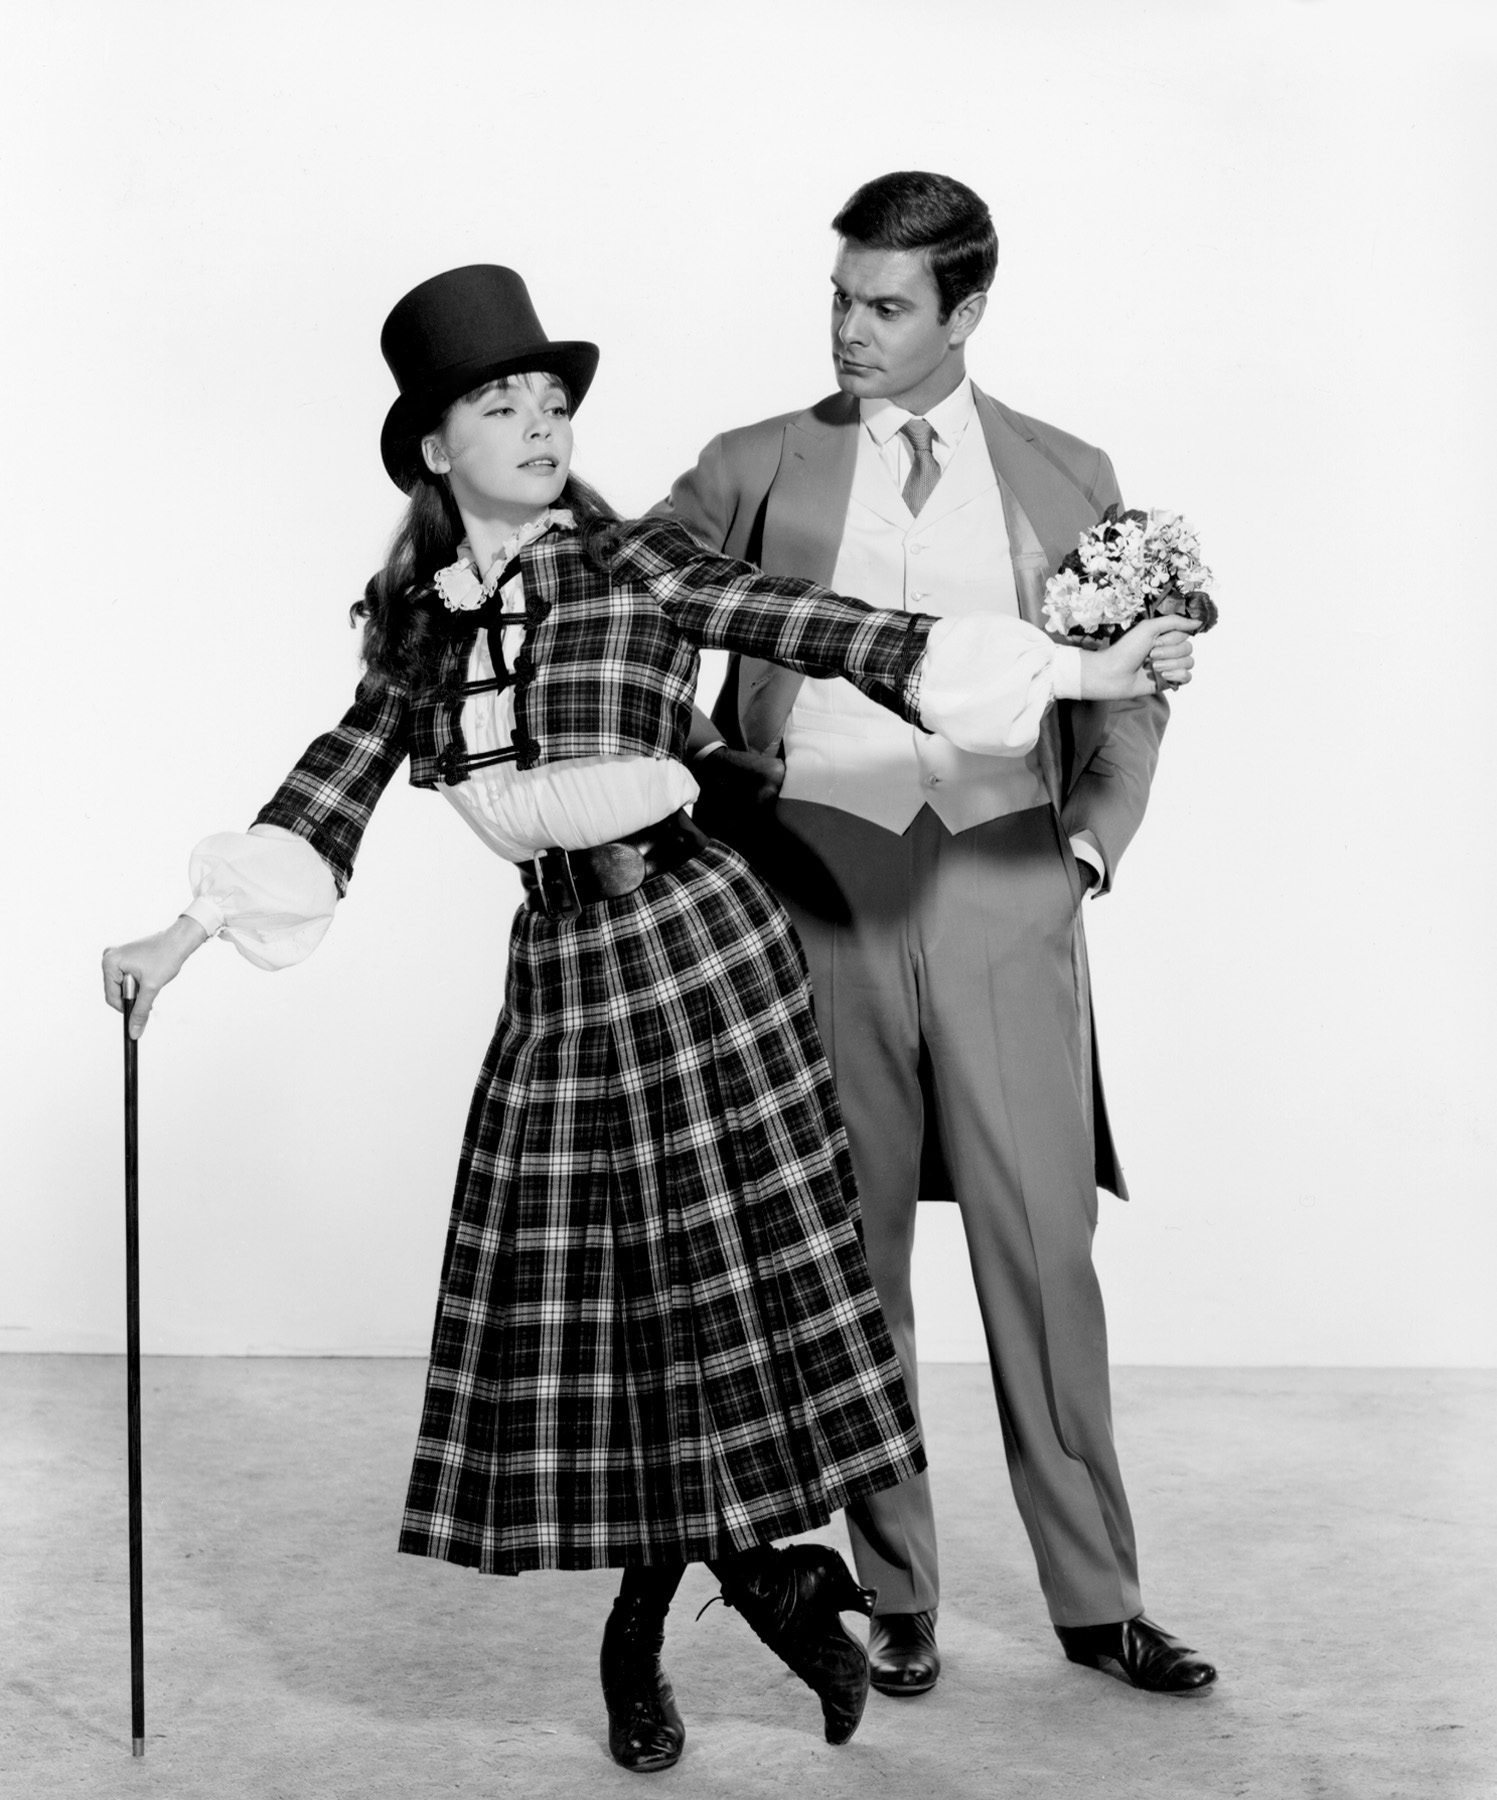 Gigi 1958 dress style